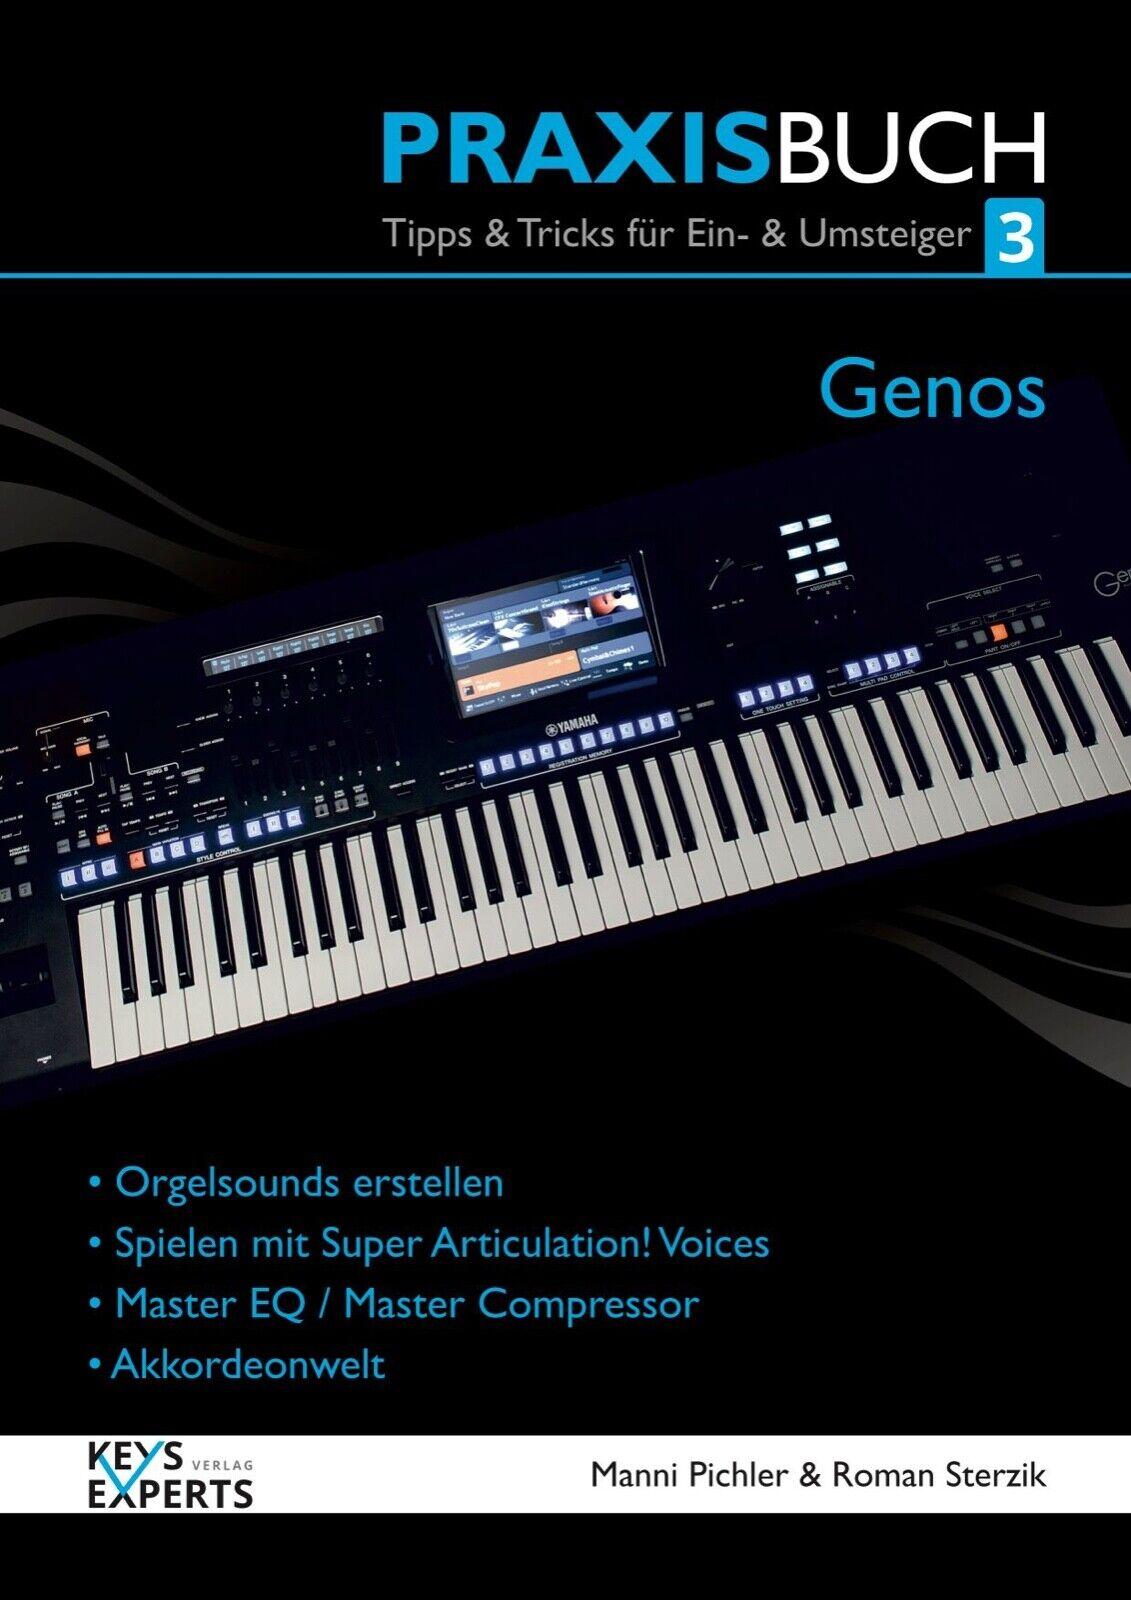 nuovo stile Das Praxisbuch per Yamaha Yamaha Yamaha Genos Tastiera Volume 3 130 Pagine Lingua Tedesco  benvenuto per ordinare